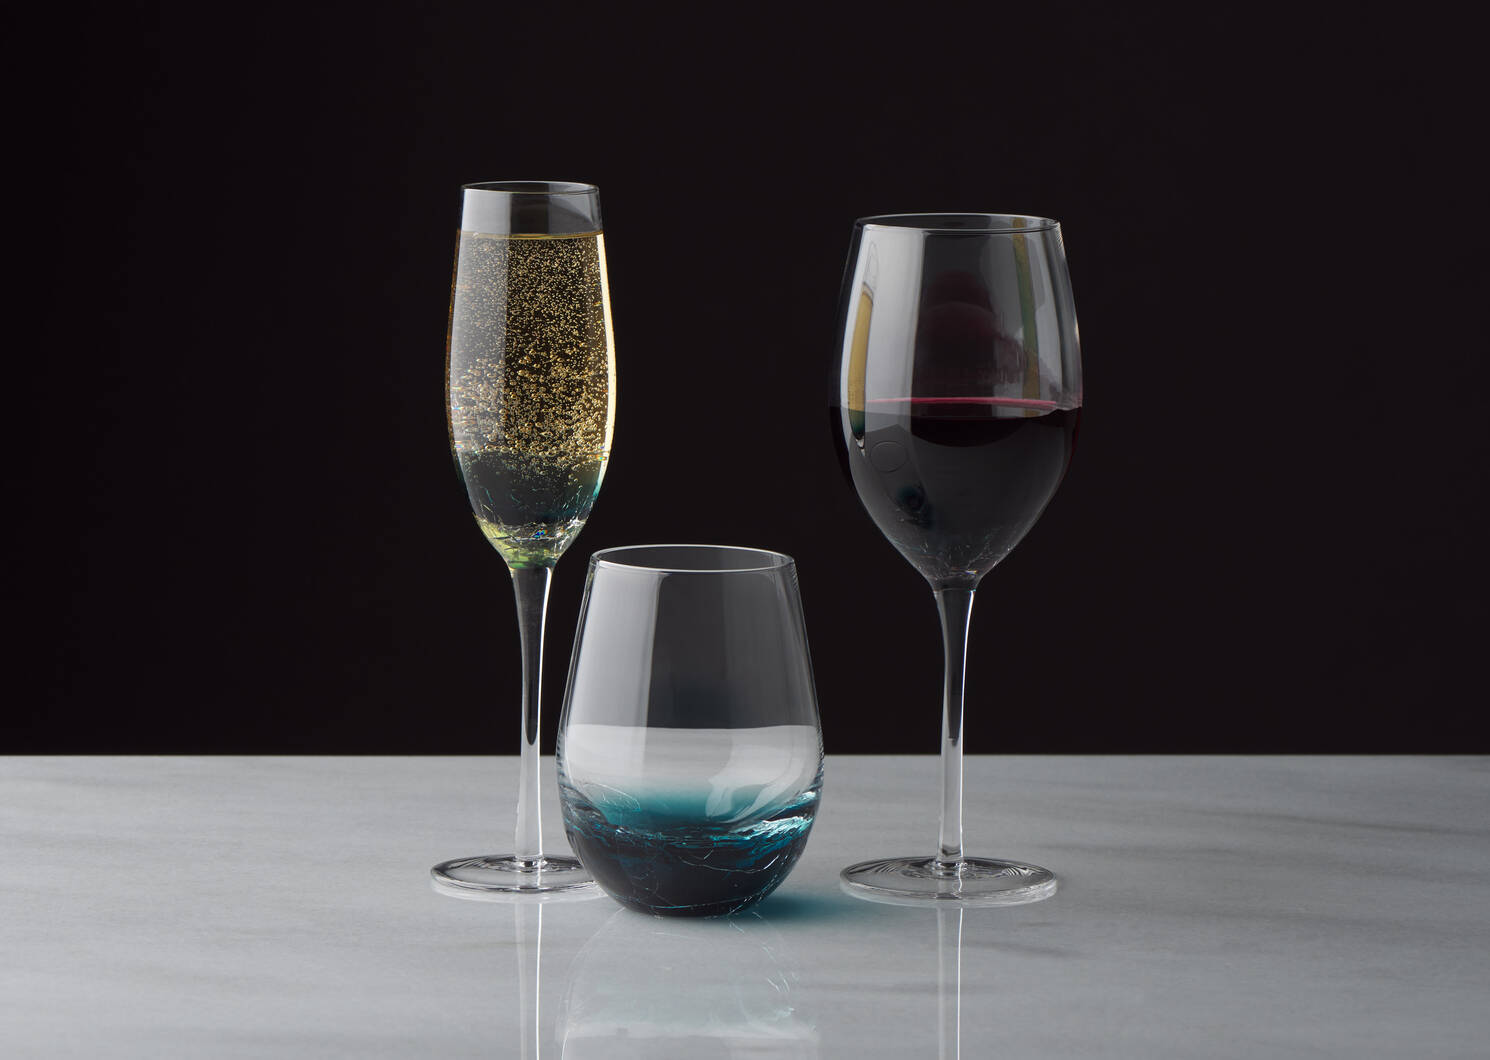 Verre à vin Lively sarcelle